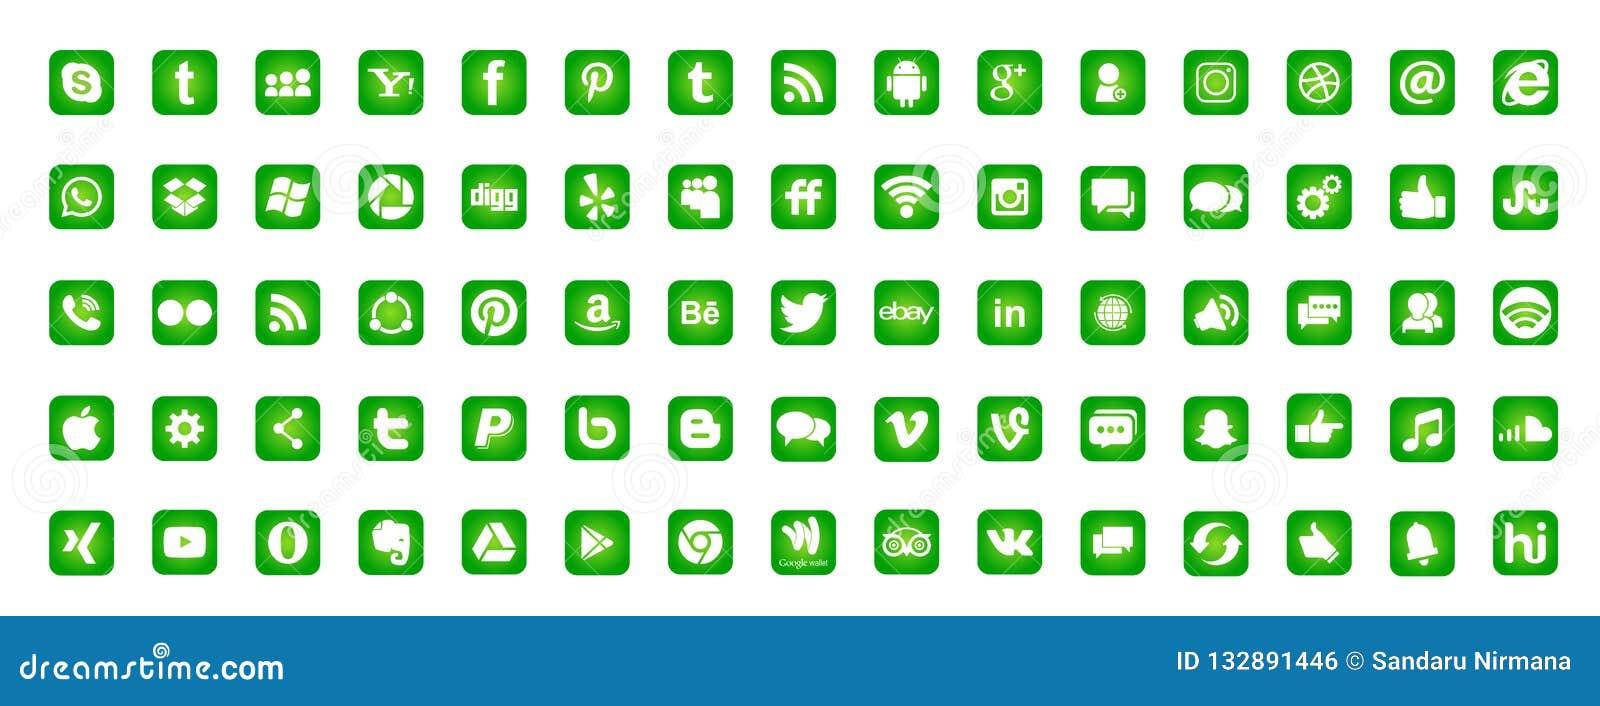 Metta delle icone sociali popolari Instagram Facebook Twitter Youtube WhatsApp LinkedIn Pinterest Blogd del logos di media su fon